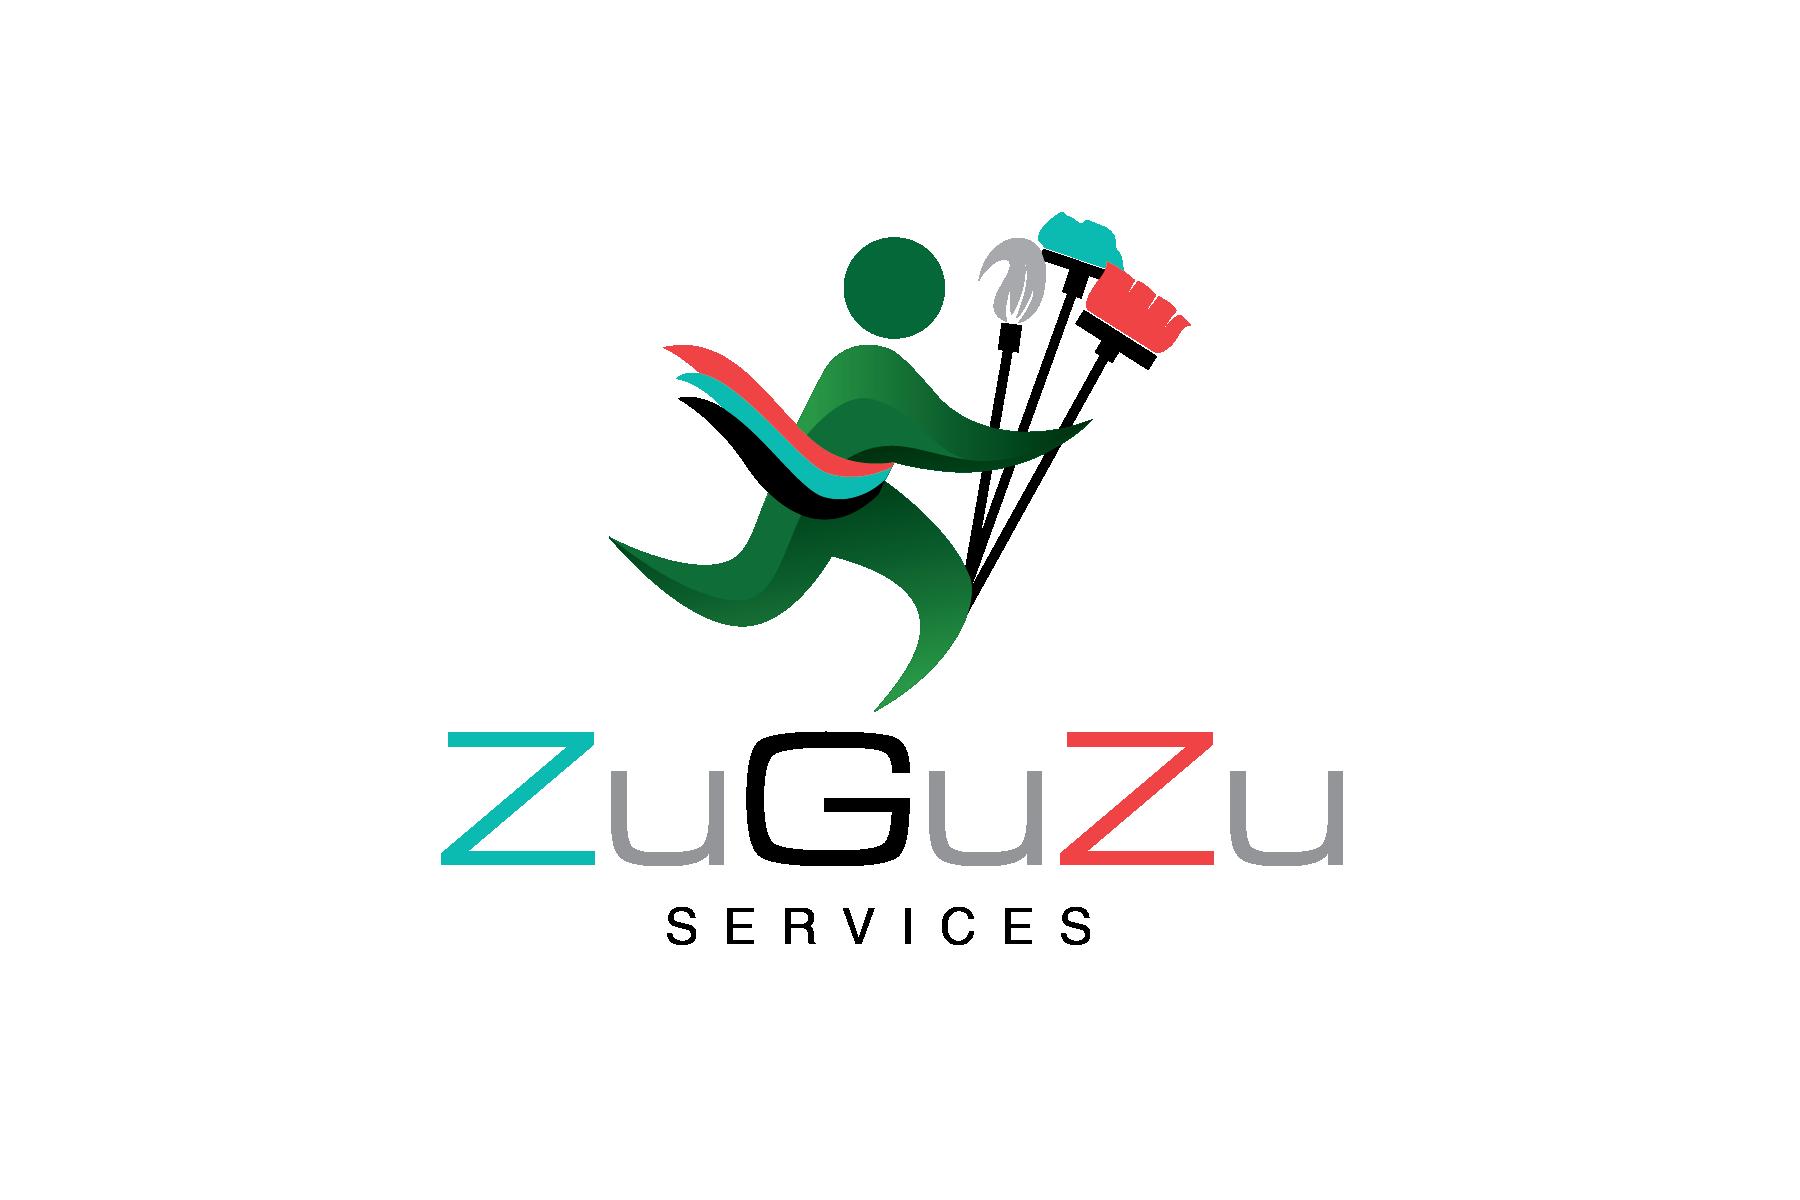 ZuguZU | Janitorial and Building Maintenance Services